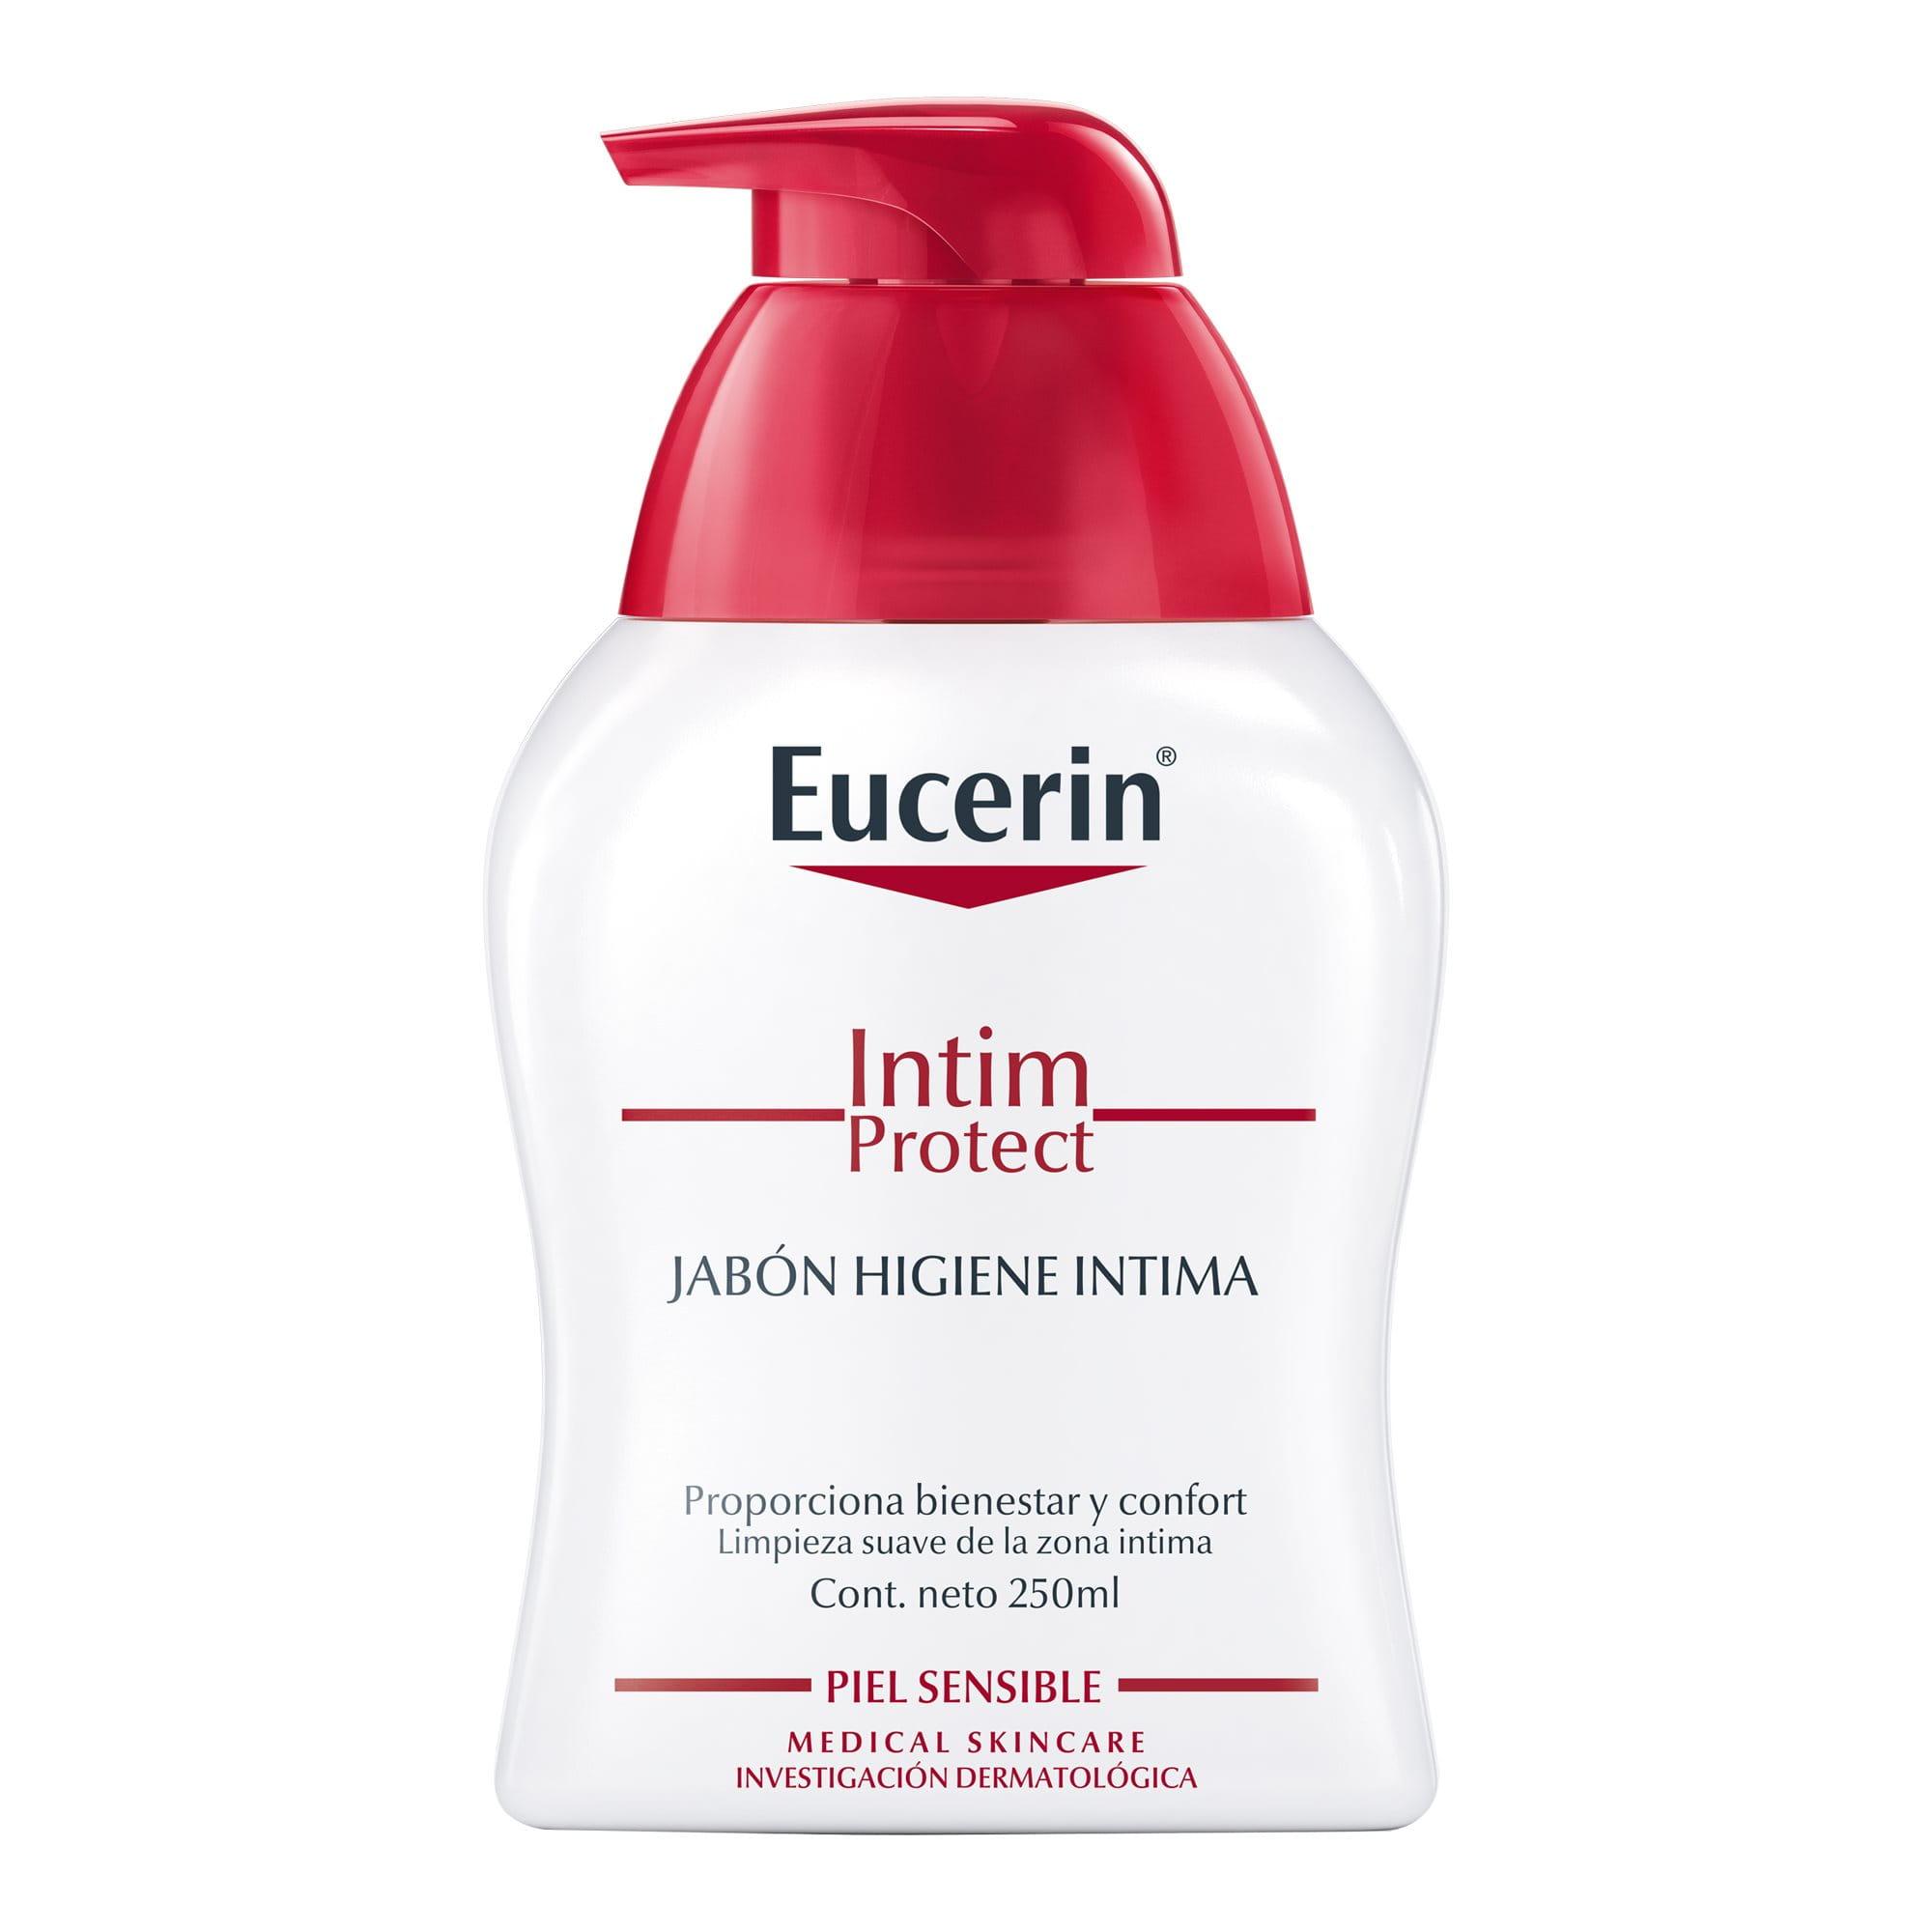 63095_Eucerin-Jabon-Higiene-intima_packshot